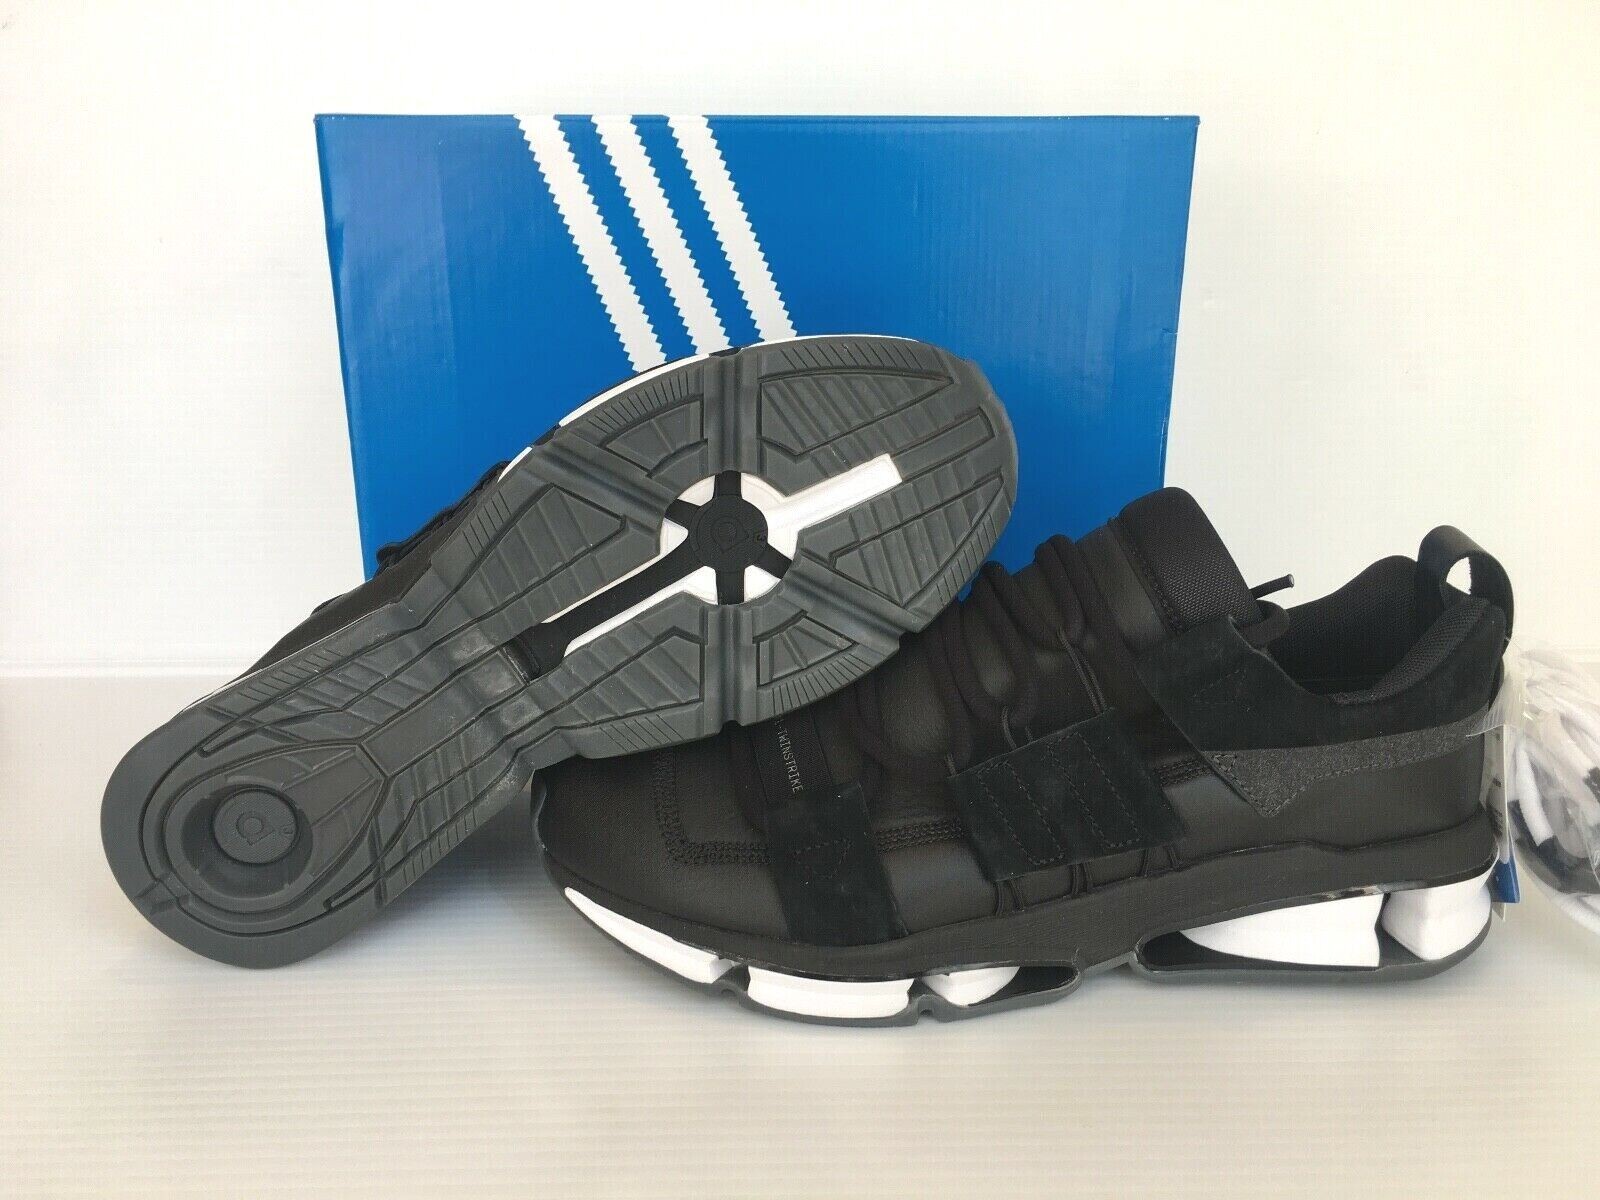 Adidas Twinstrike ADV Stretch Men's Sz 11 Leather Sneakers Black B28015